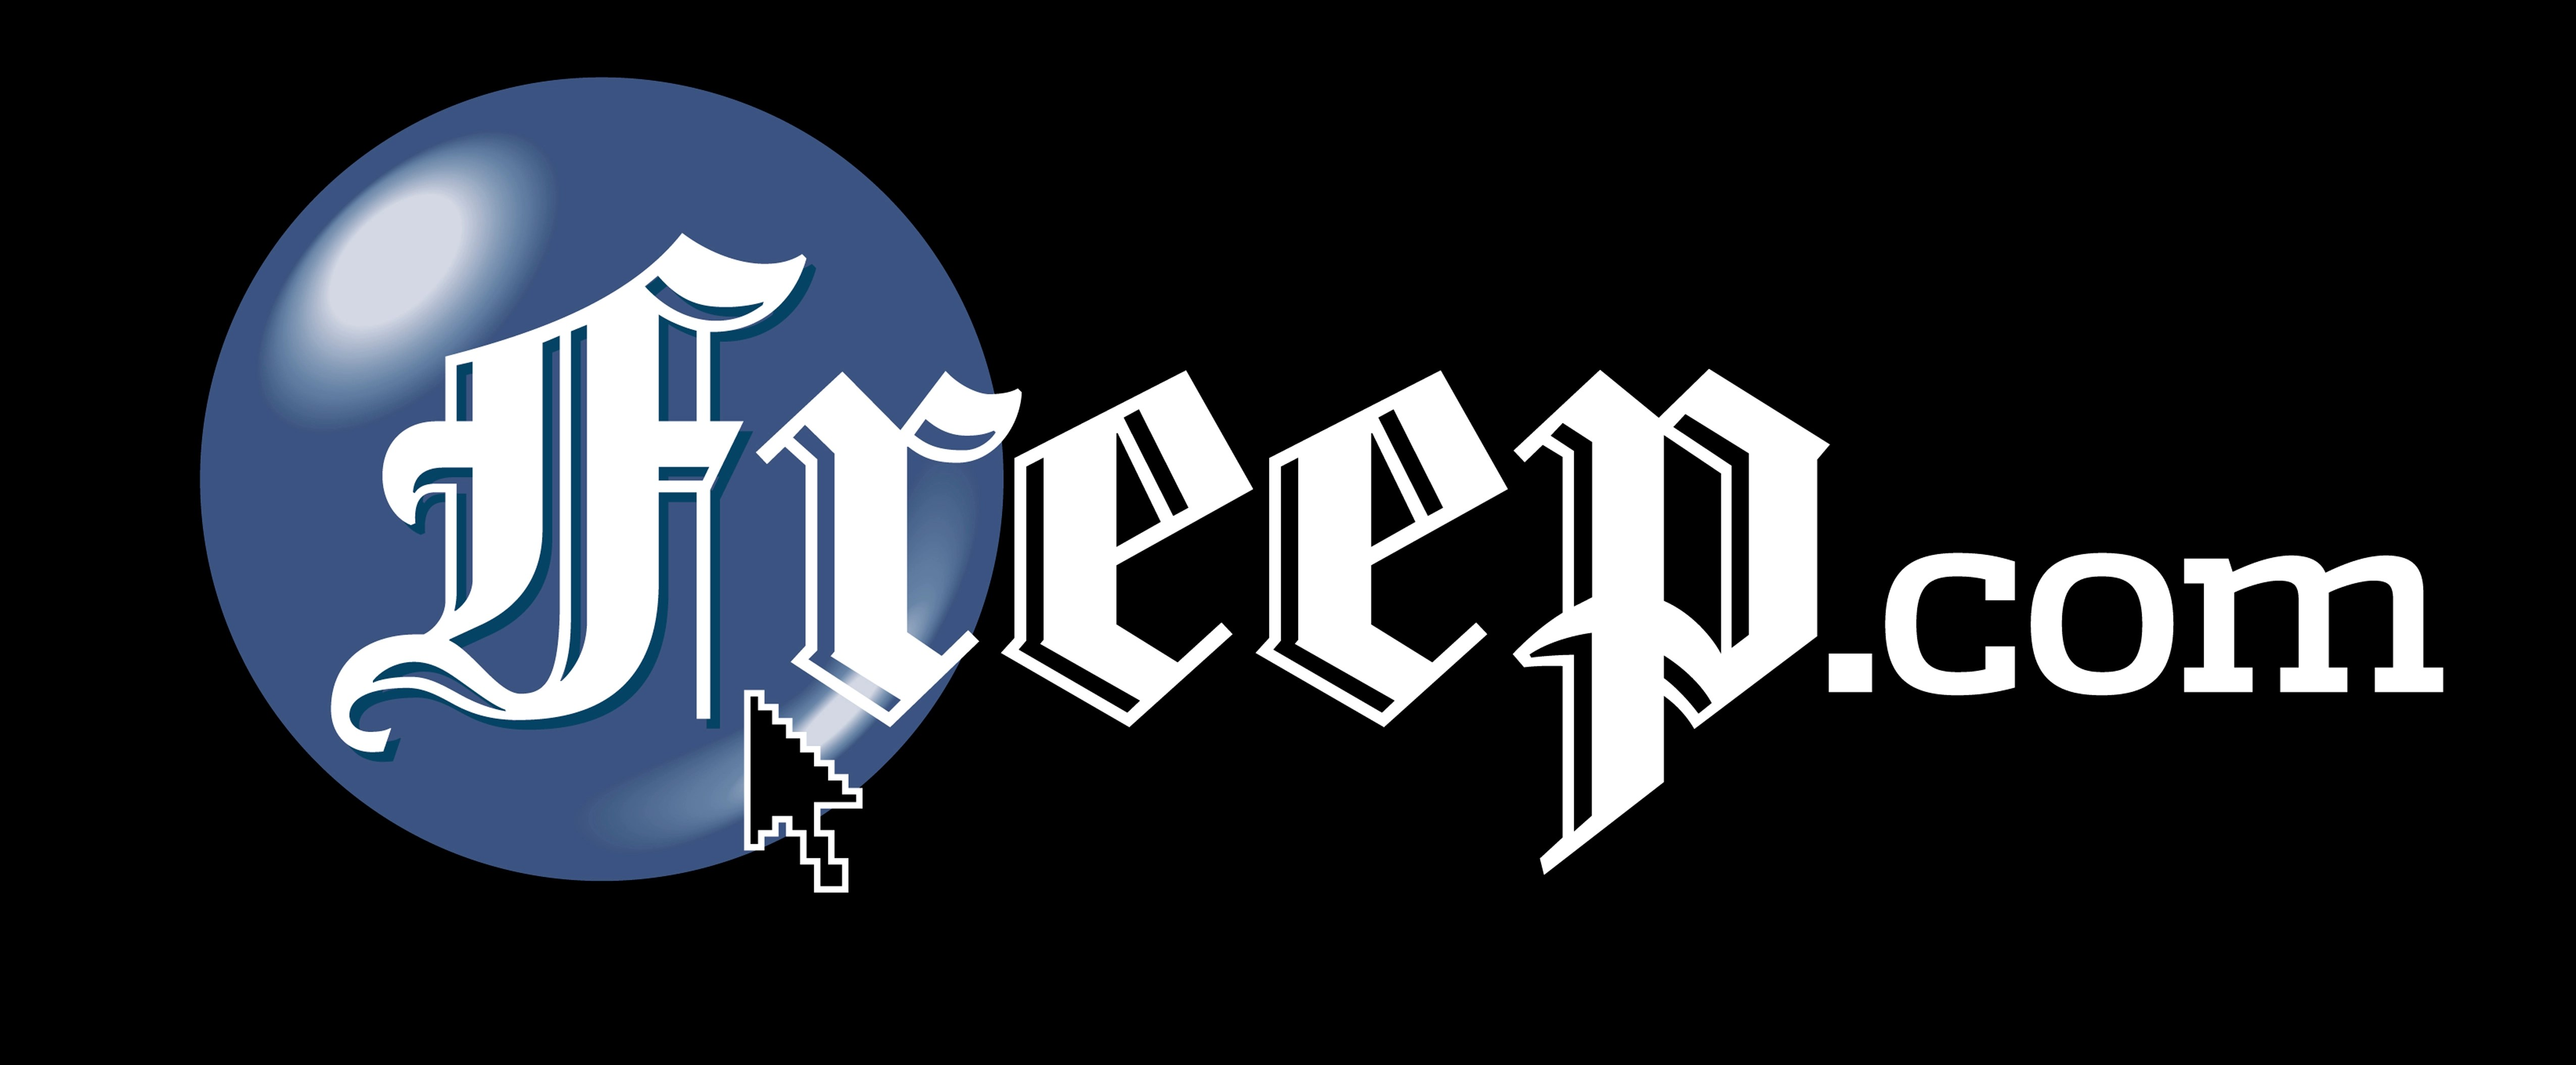 new freep web